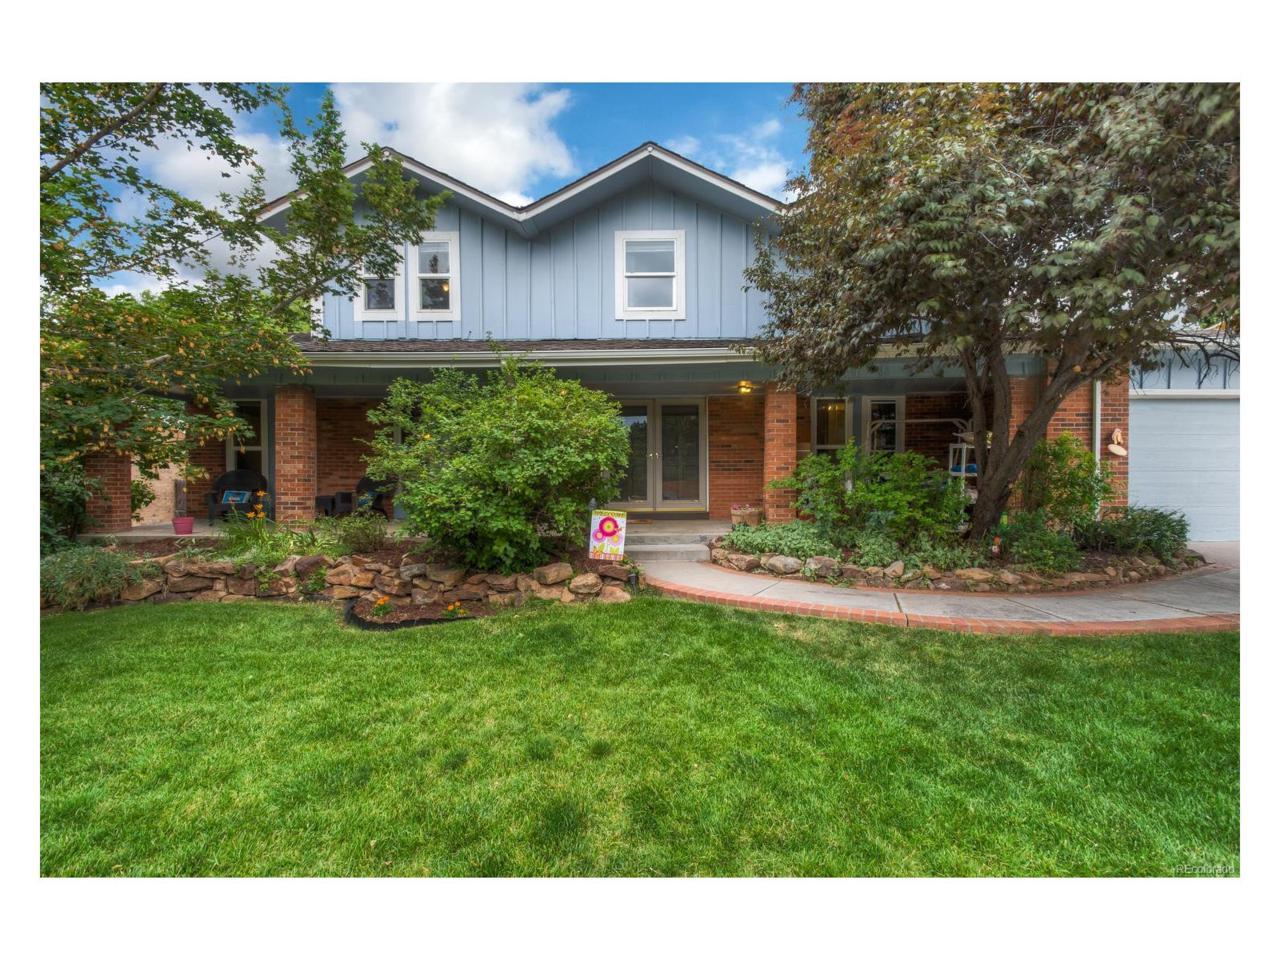 5846 S Ironton Court, Englewood, CO 80111 (MLS #2158064) :: 8z Real Estate